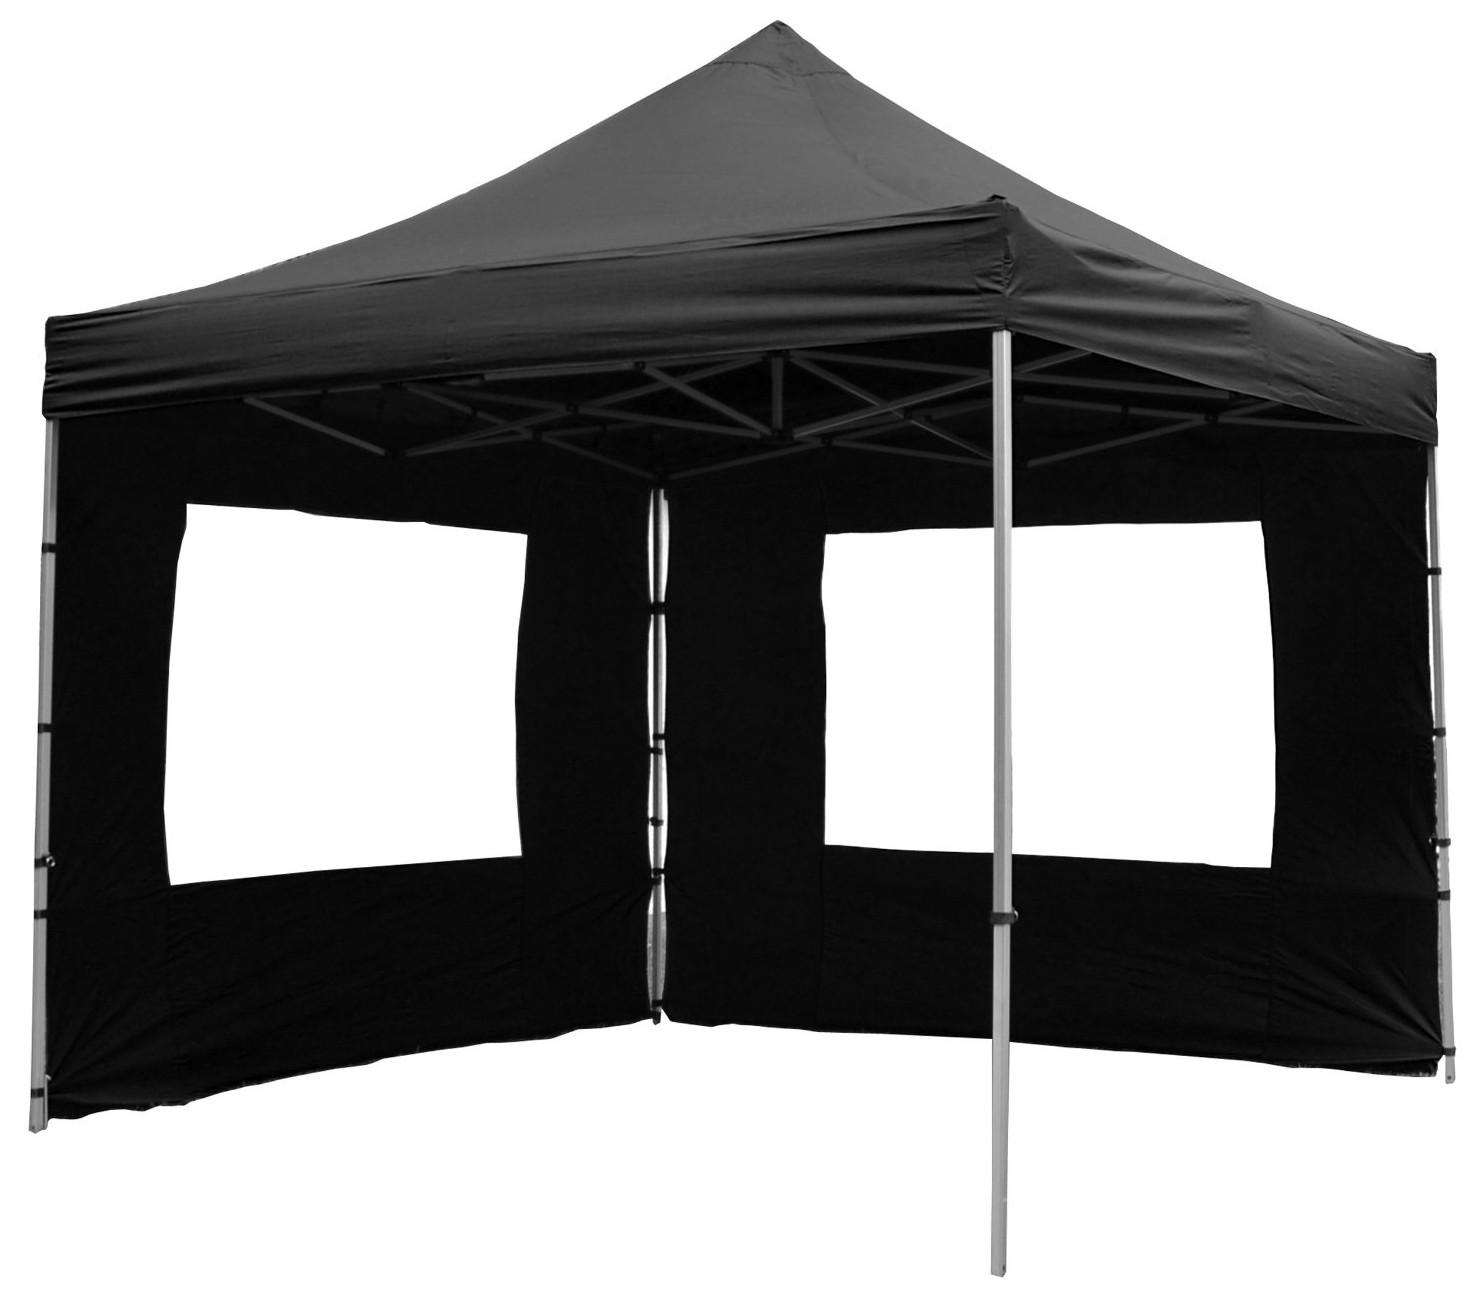 pavillon faltbar pavillon. Black Bedroom Furniture Sets. Home Design Ideas